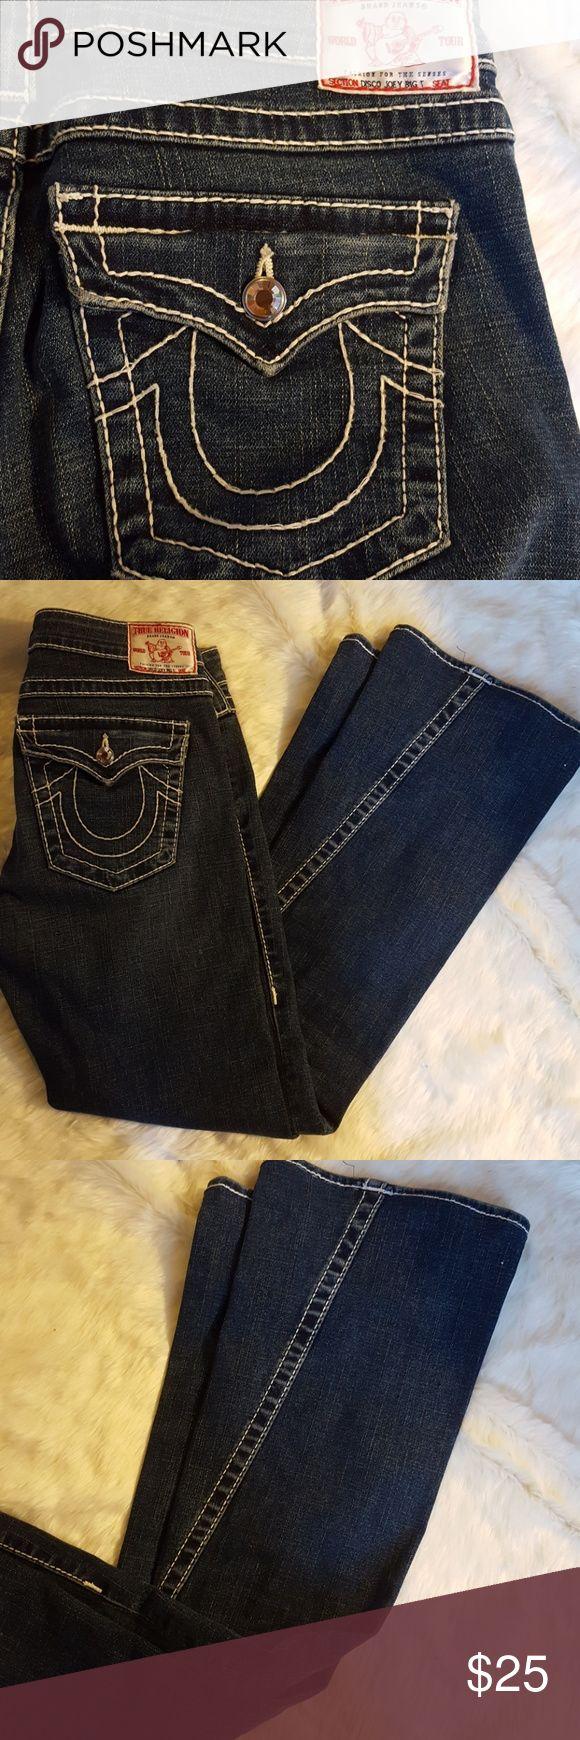 True religion  jeans True religion jeans  32 inseam True Religion Jeans